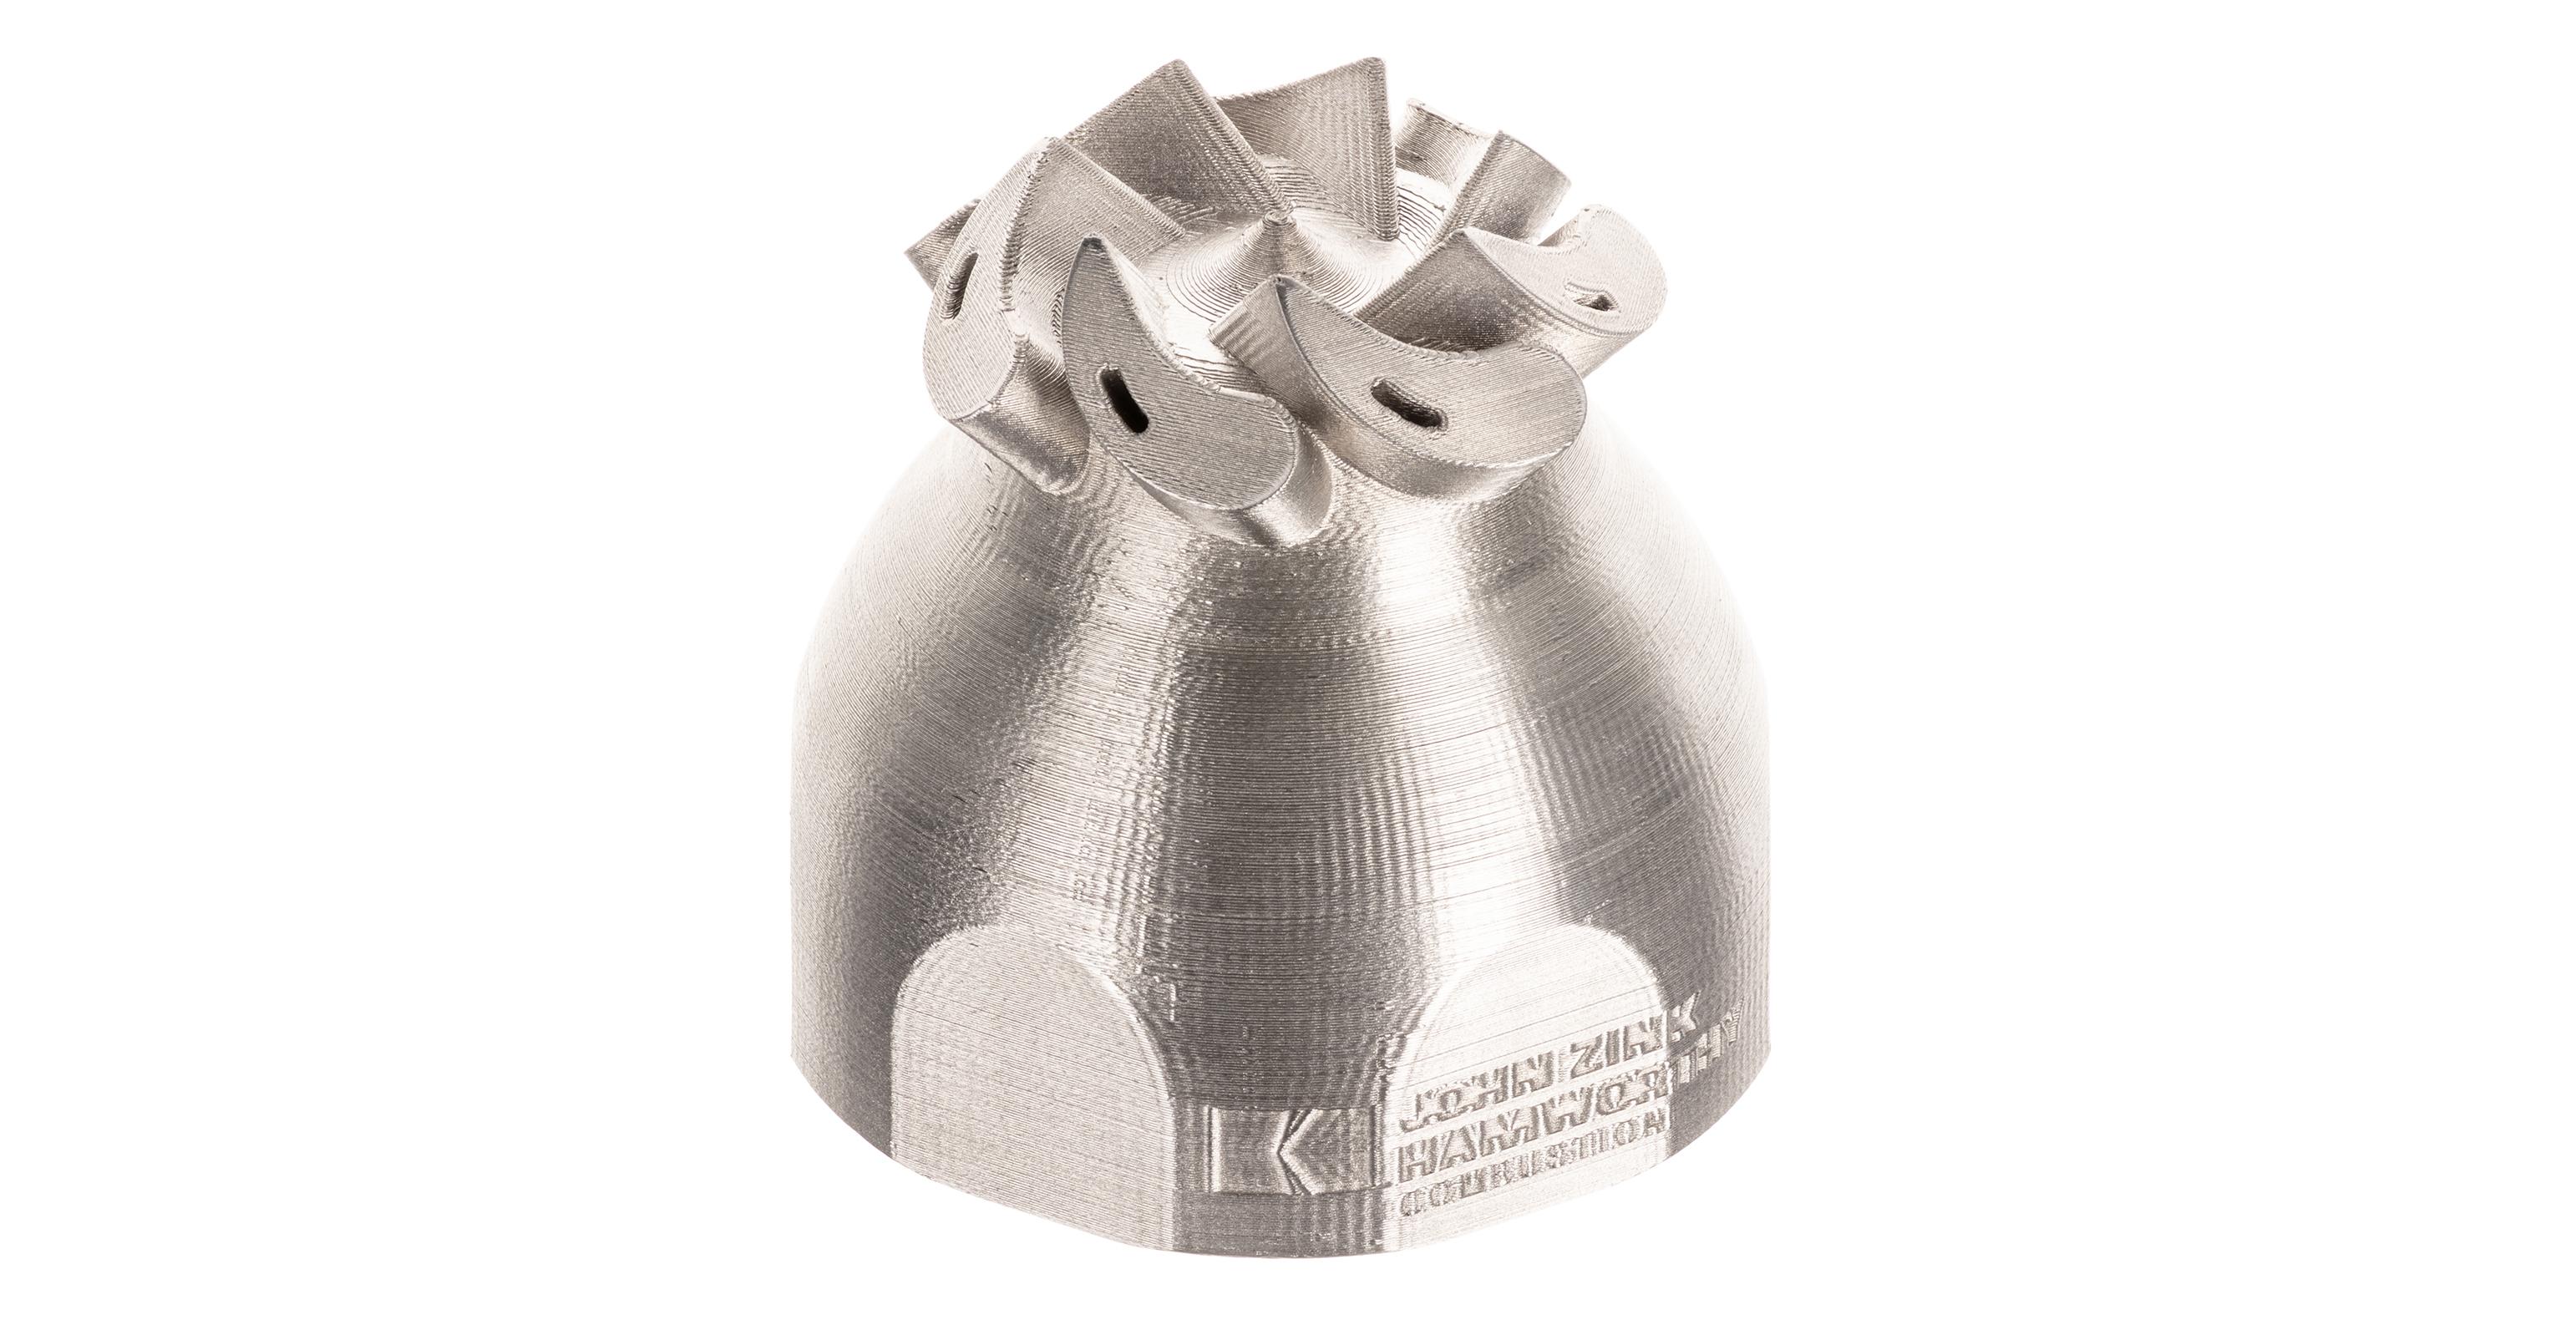 Ugelli del carburante per autocisterne metalli per la stampa 3D